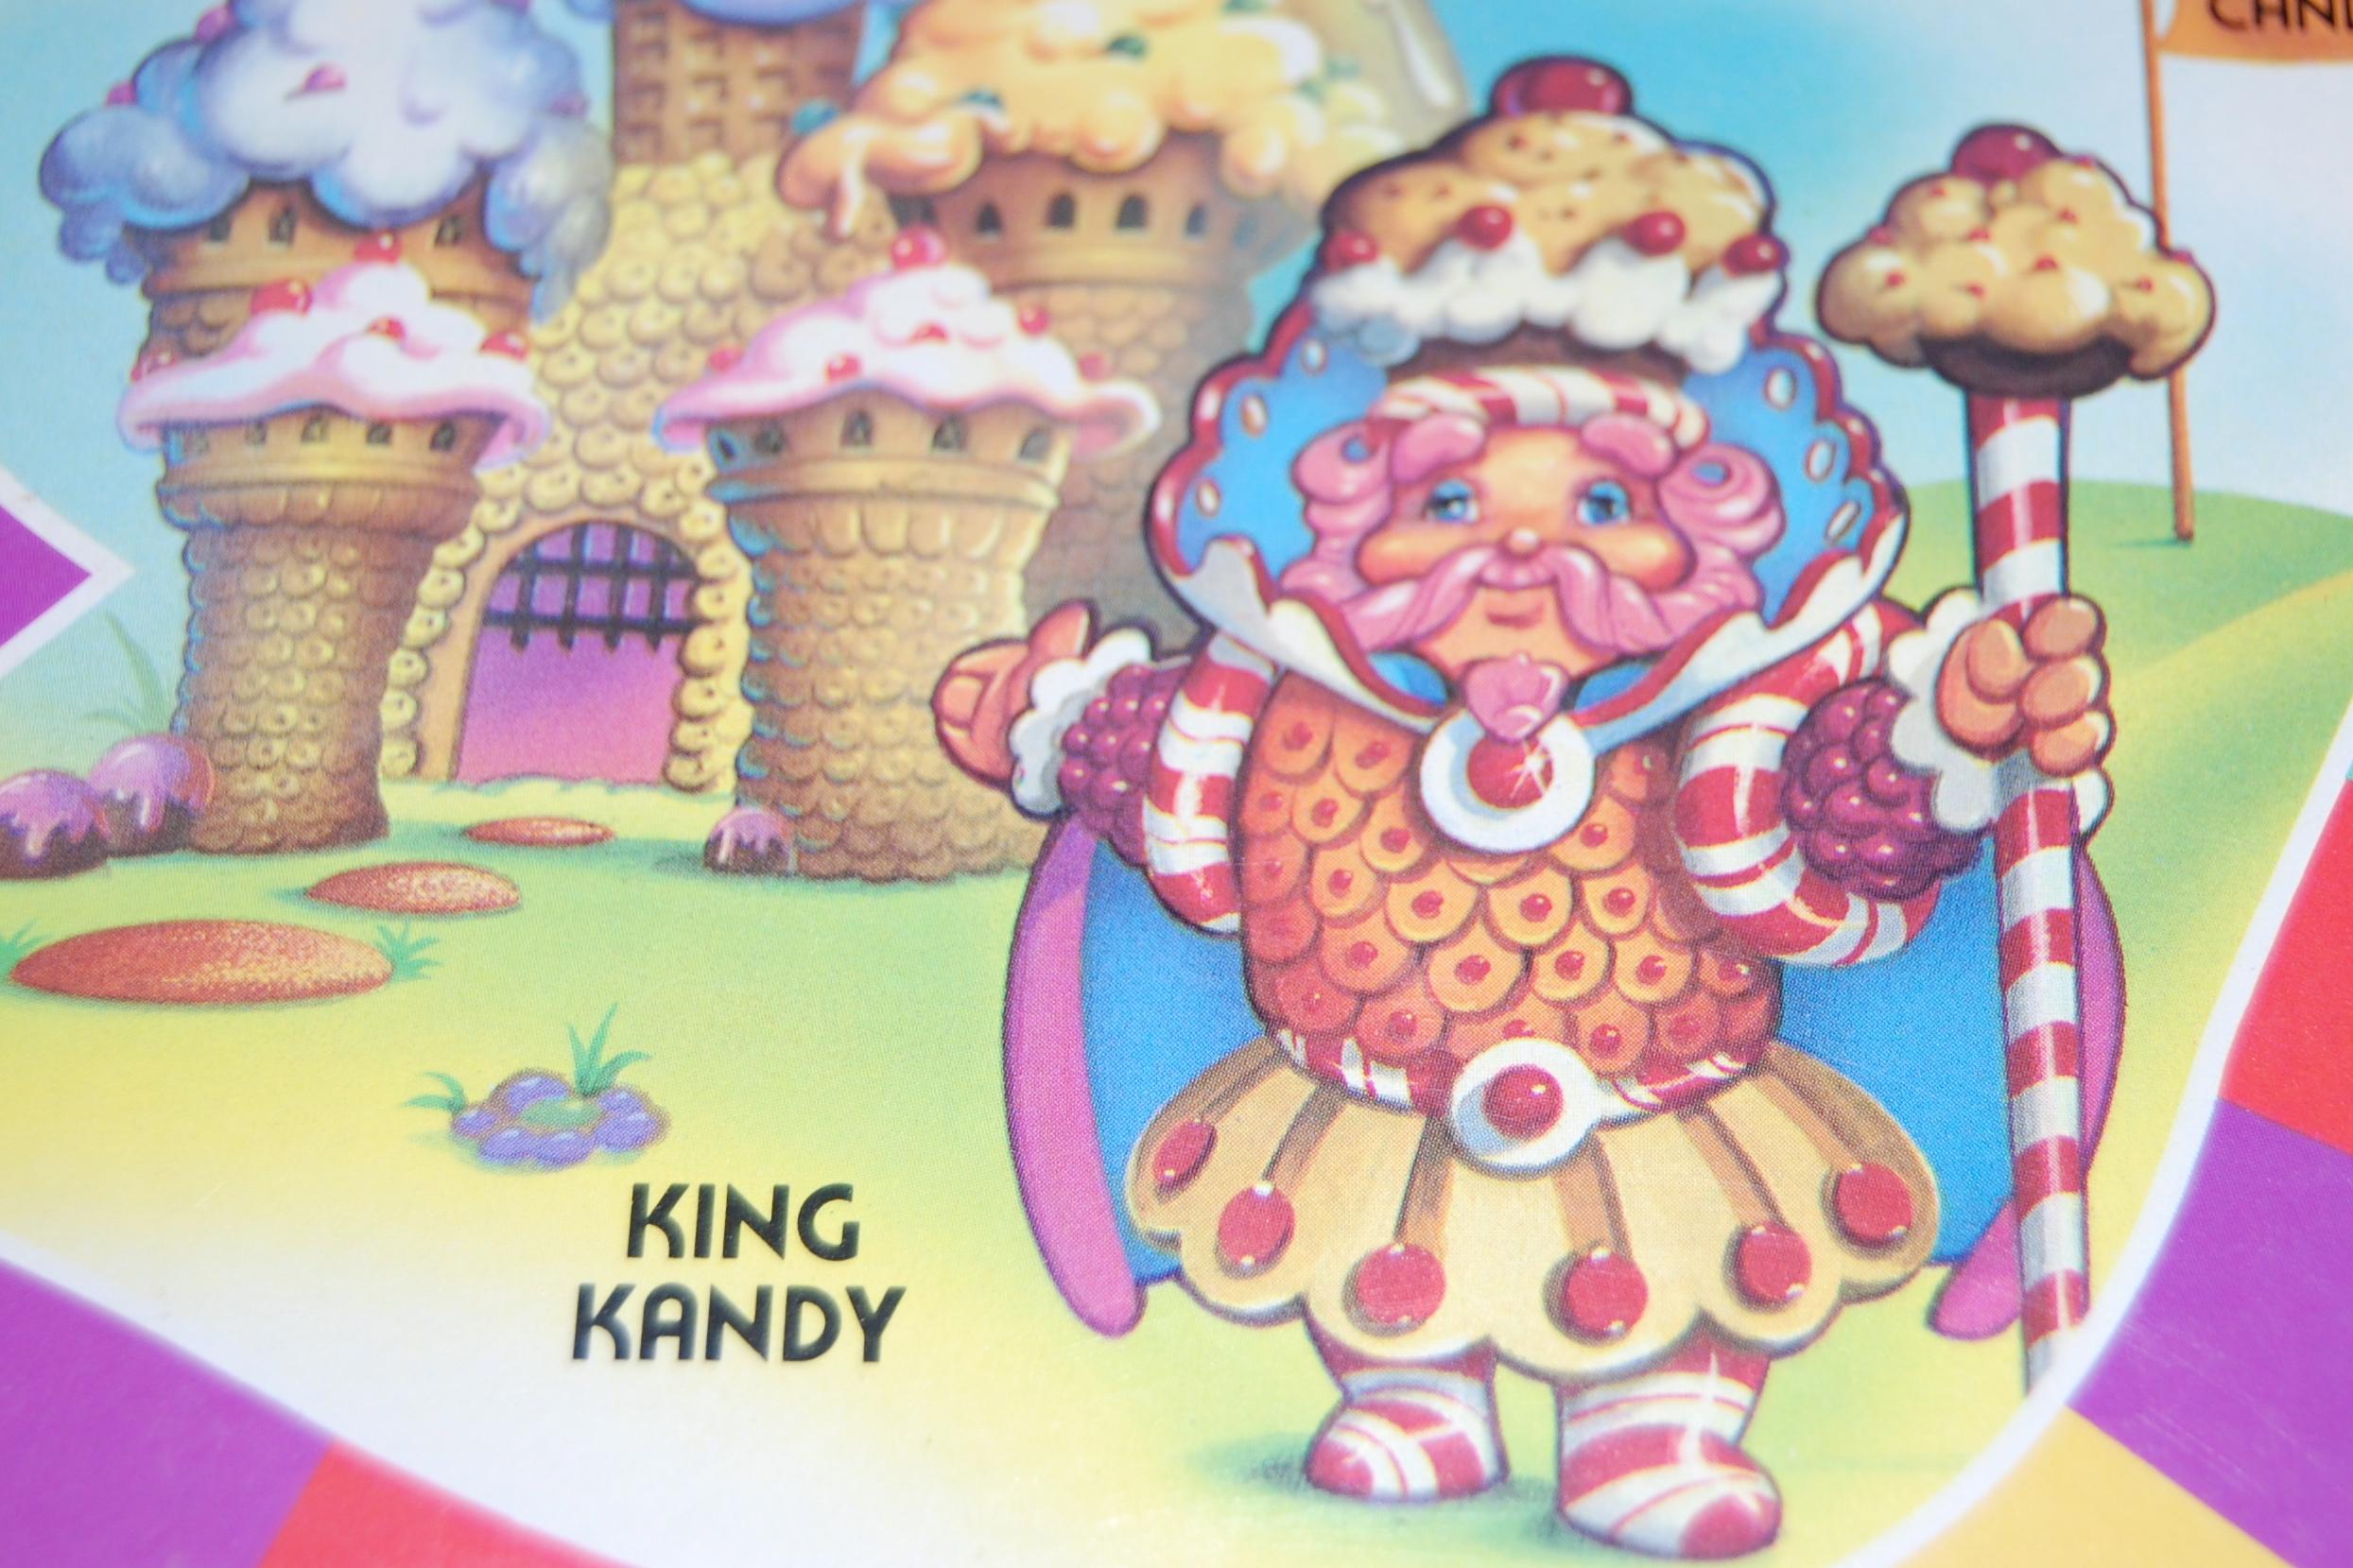 Candyland King Candy The Cultural Evolution...